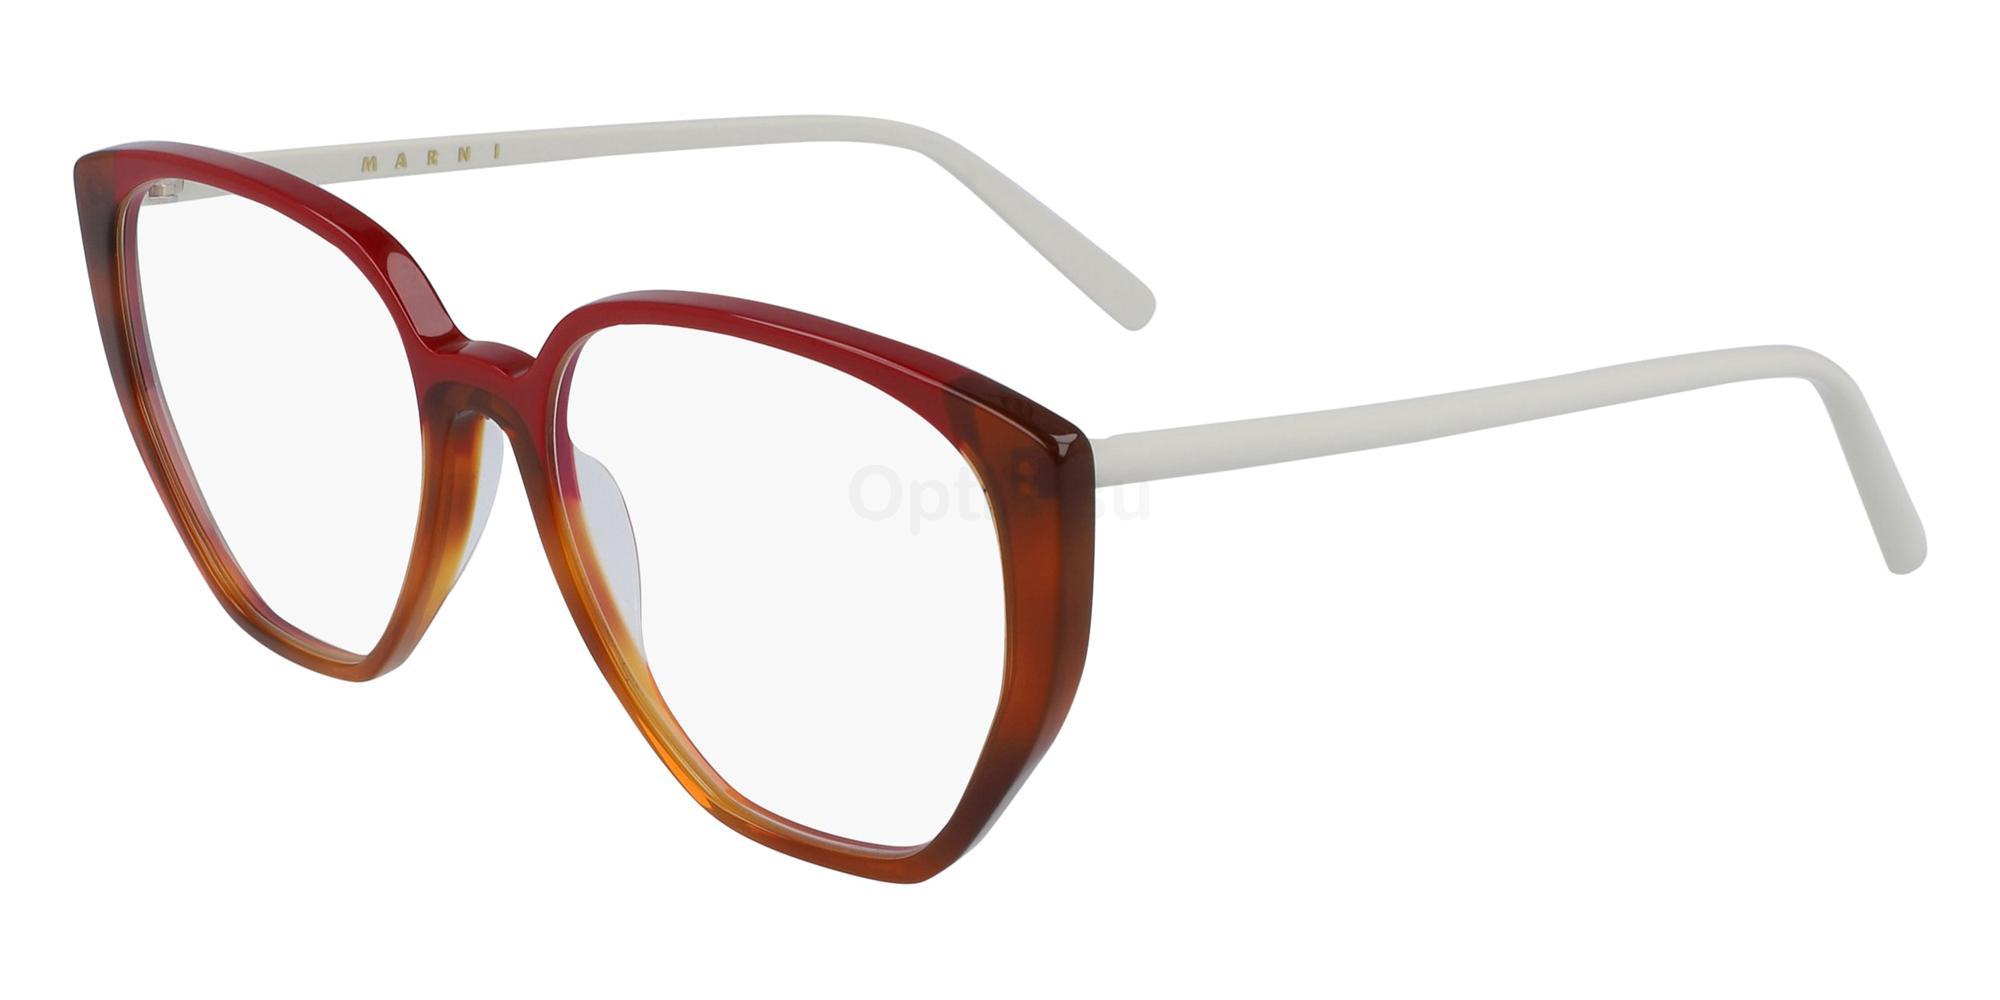 214 ME2636 Glasses, Marni